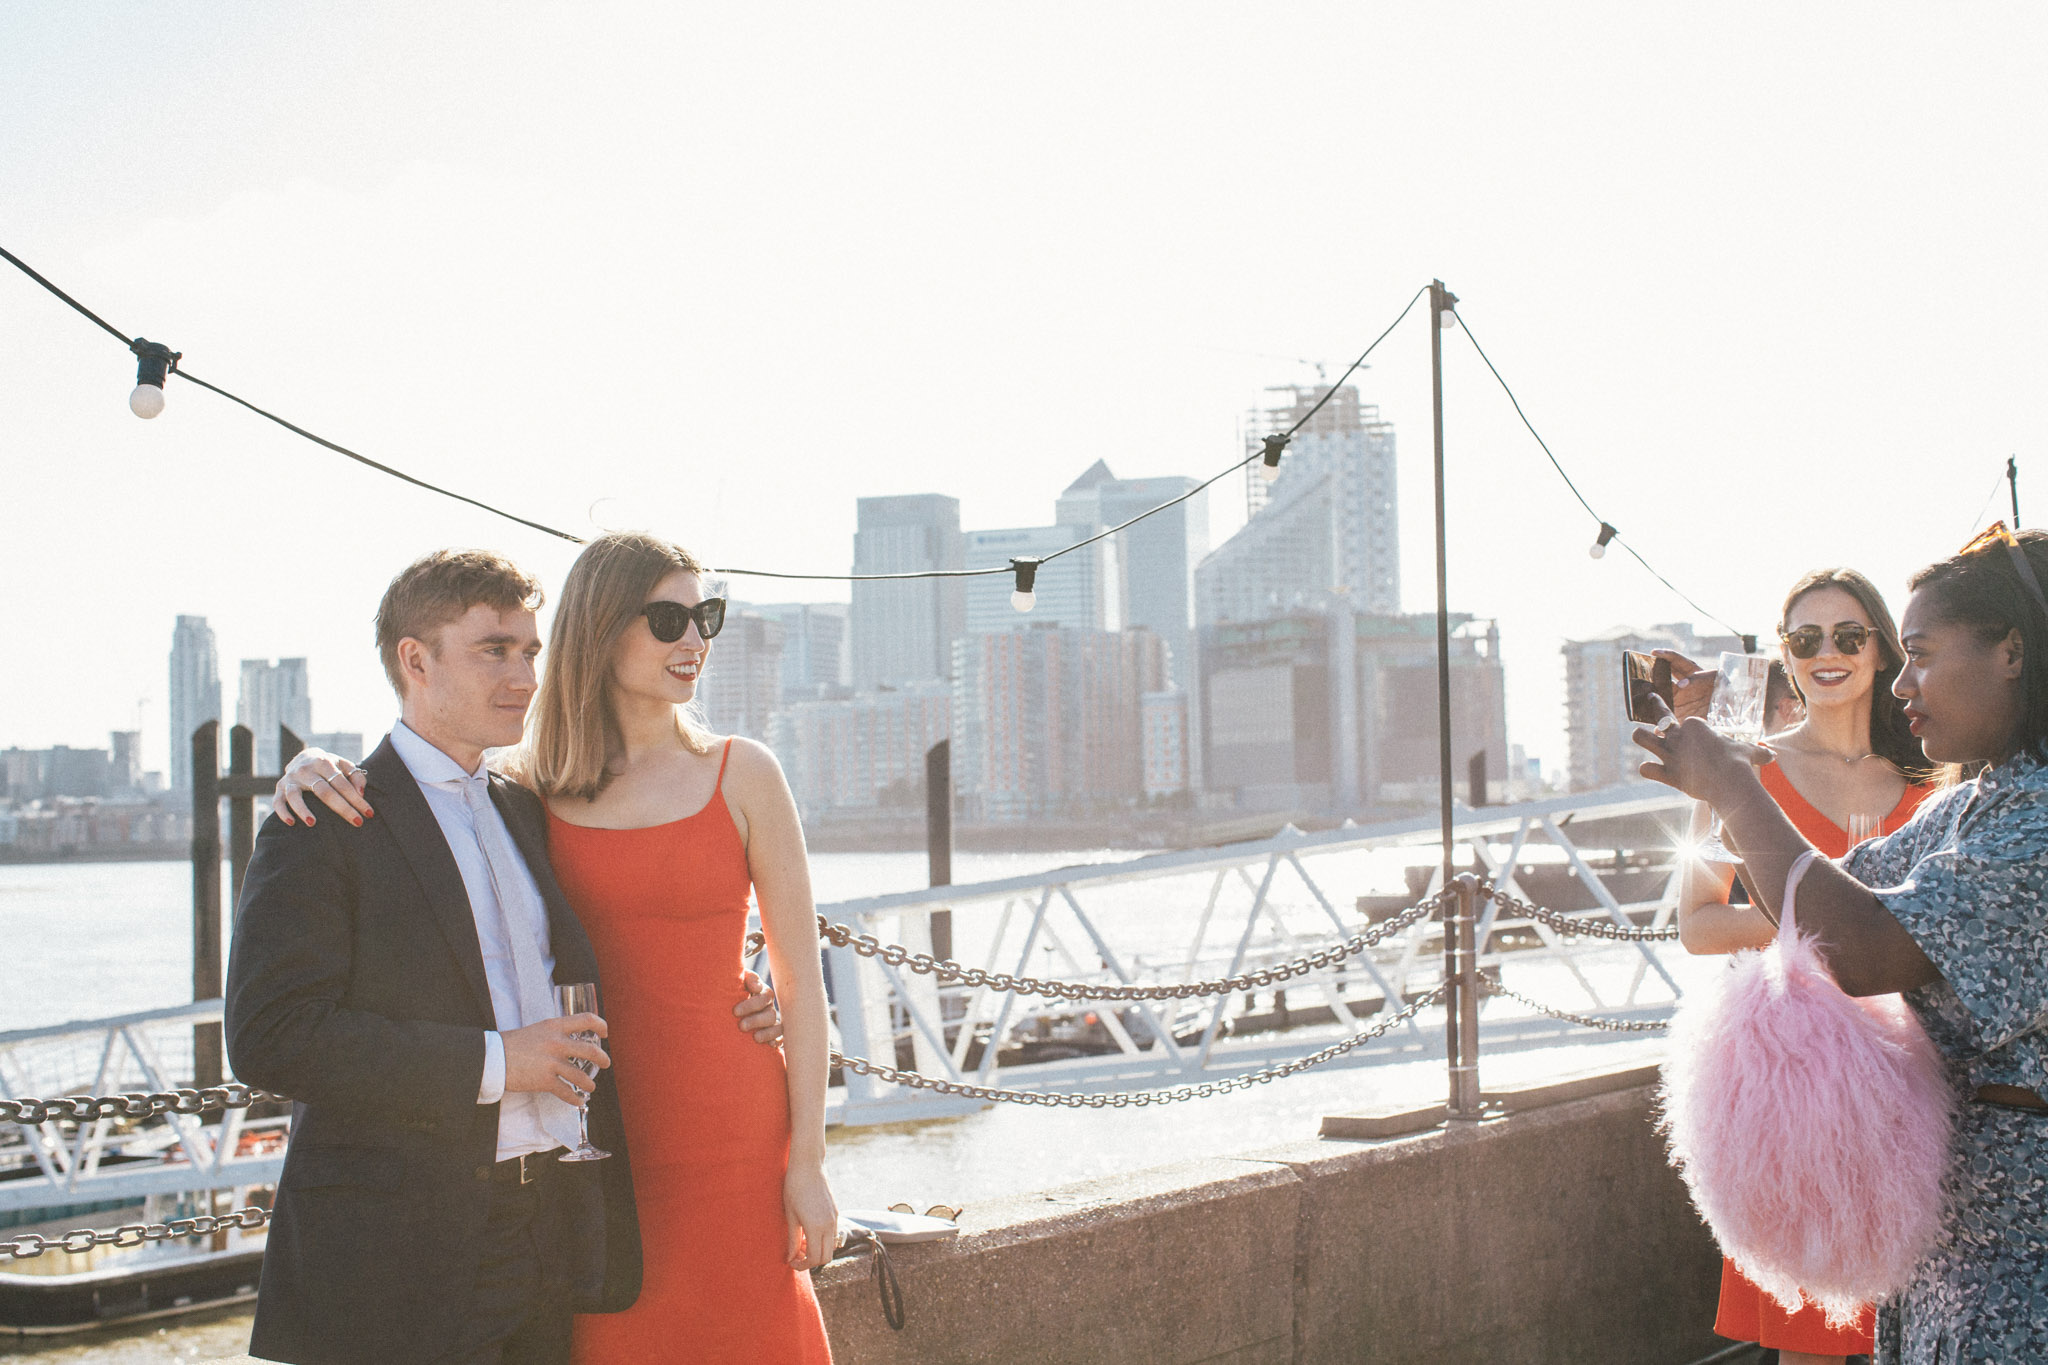 trinity_buoy_wharf_hackney_town_hall_wedding_410.jpg